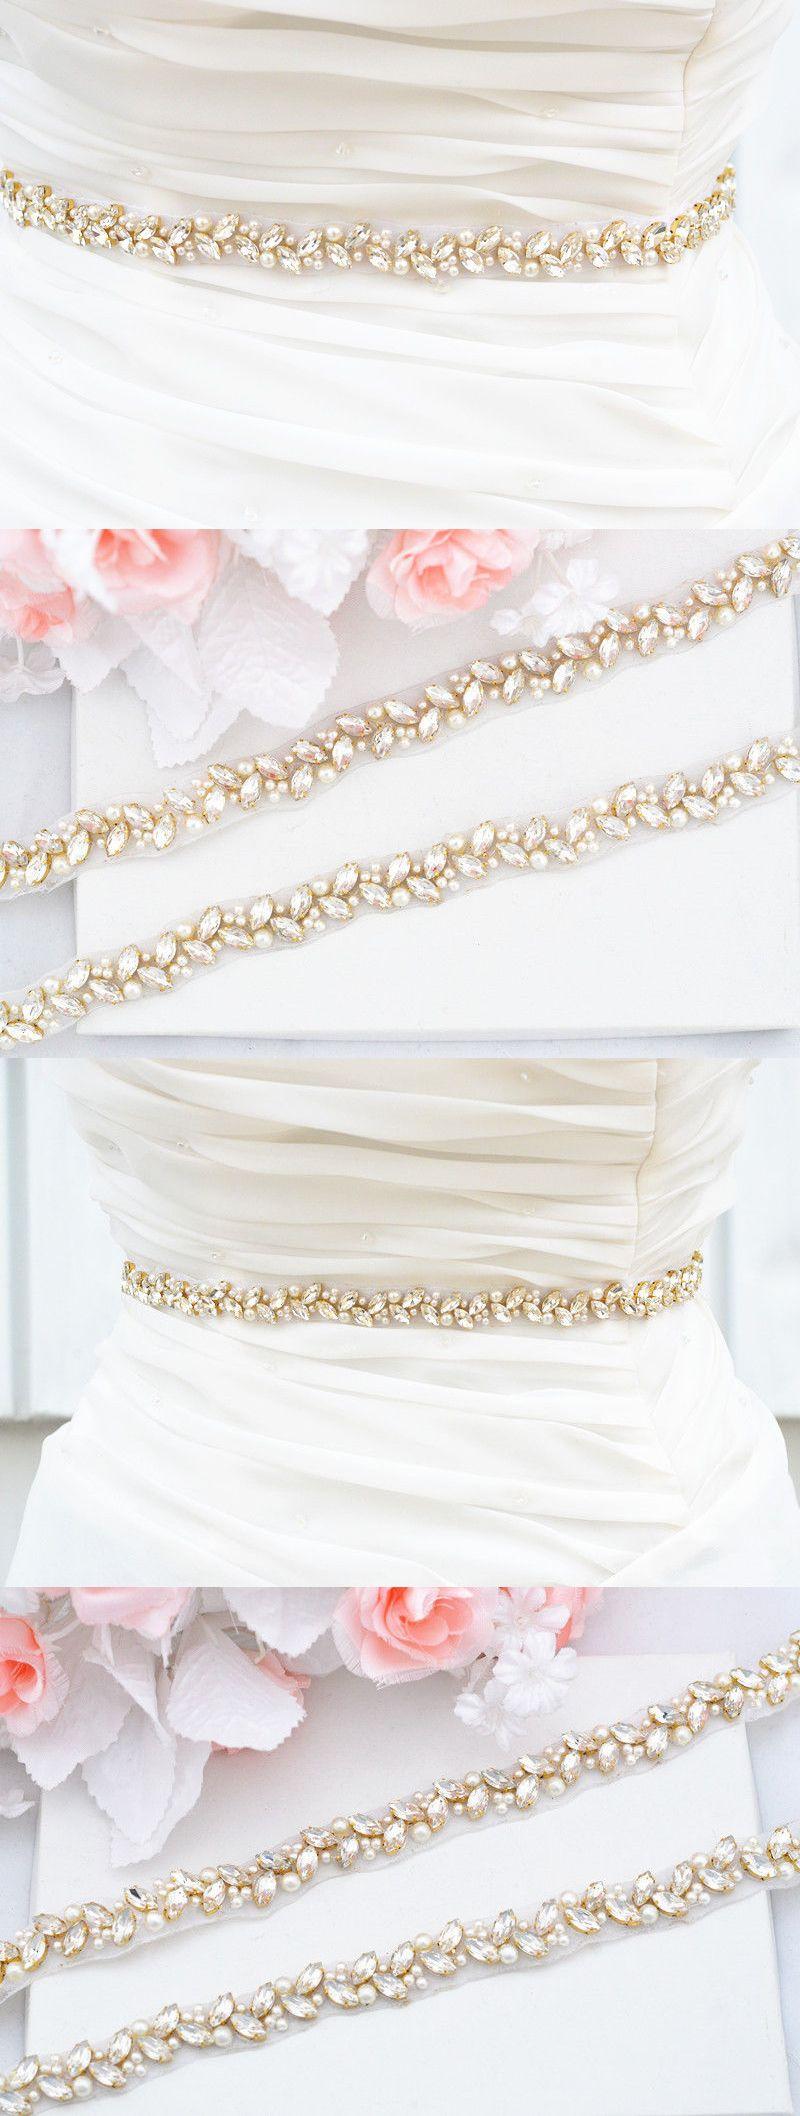 Gold belt for wedding dress  Belts and Sashes  Gold Wedding Belt Bridal Belt Sash Belt